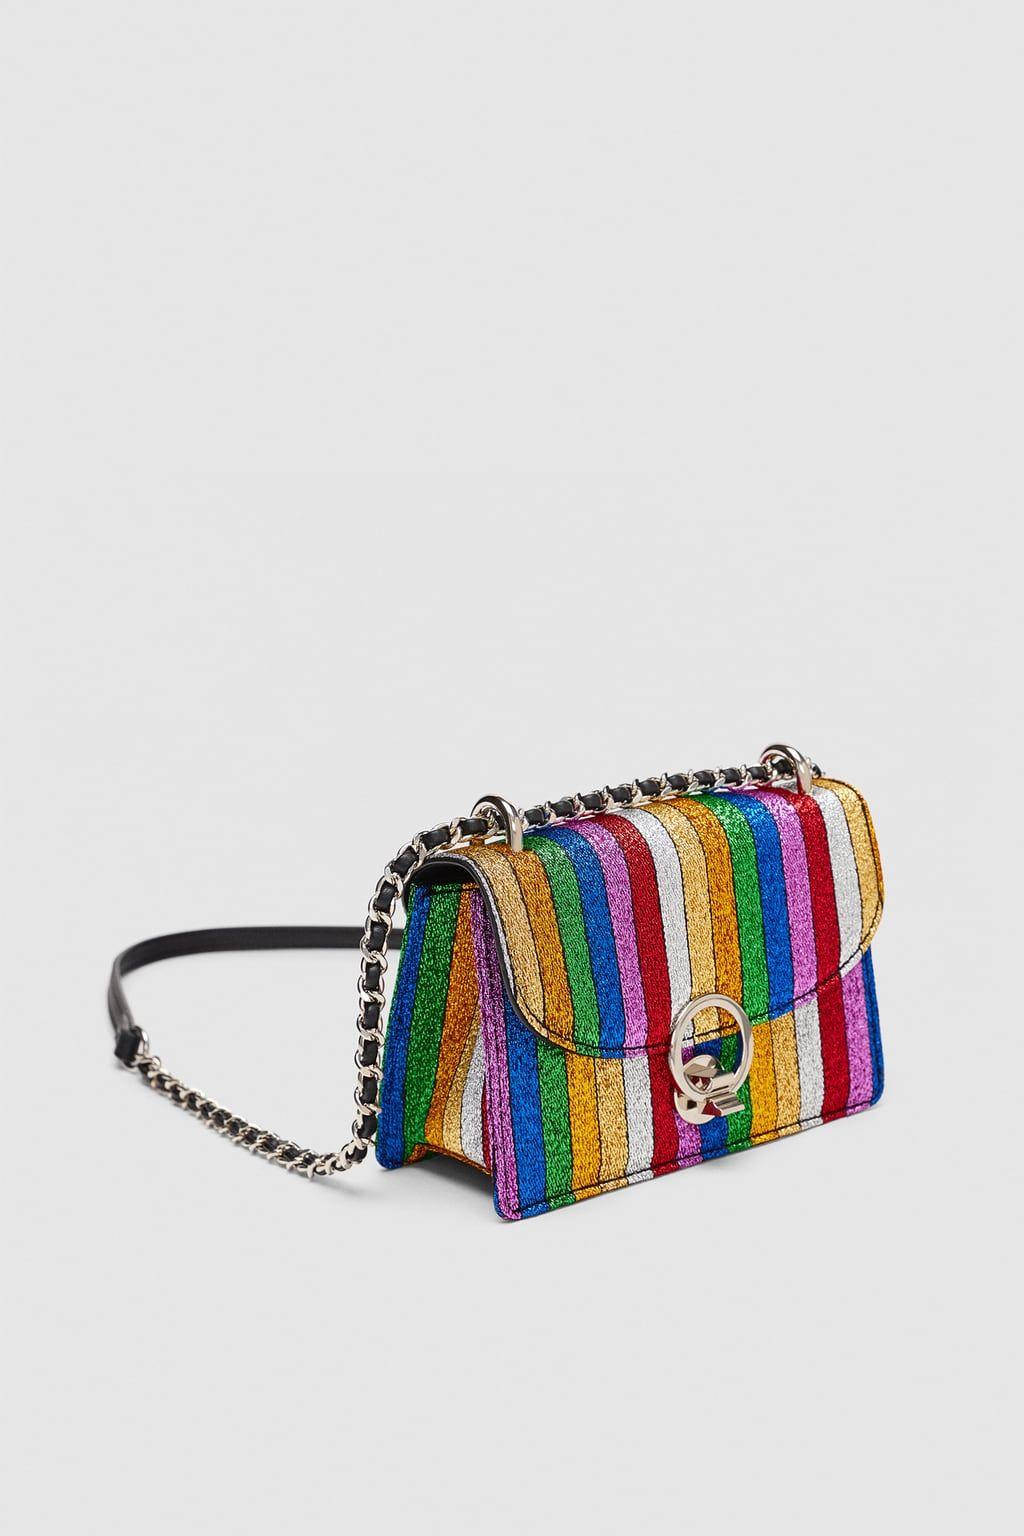 Mini Bandoulière Sac De Multicolores Image 1 Zara À Rayures wNn0v8m